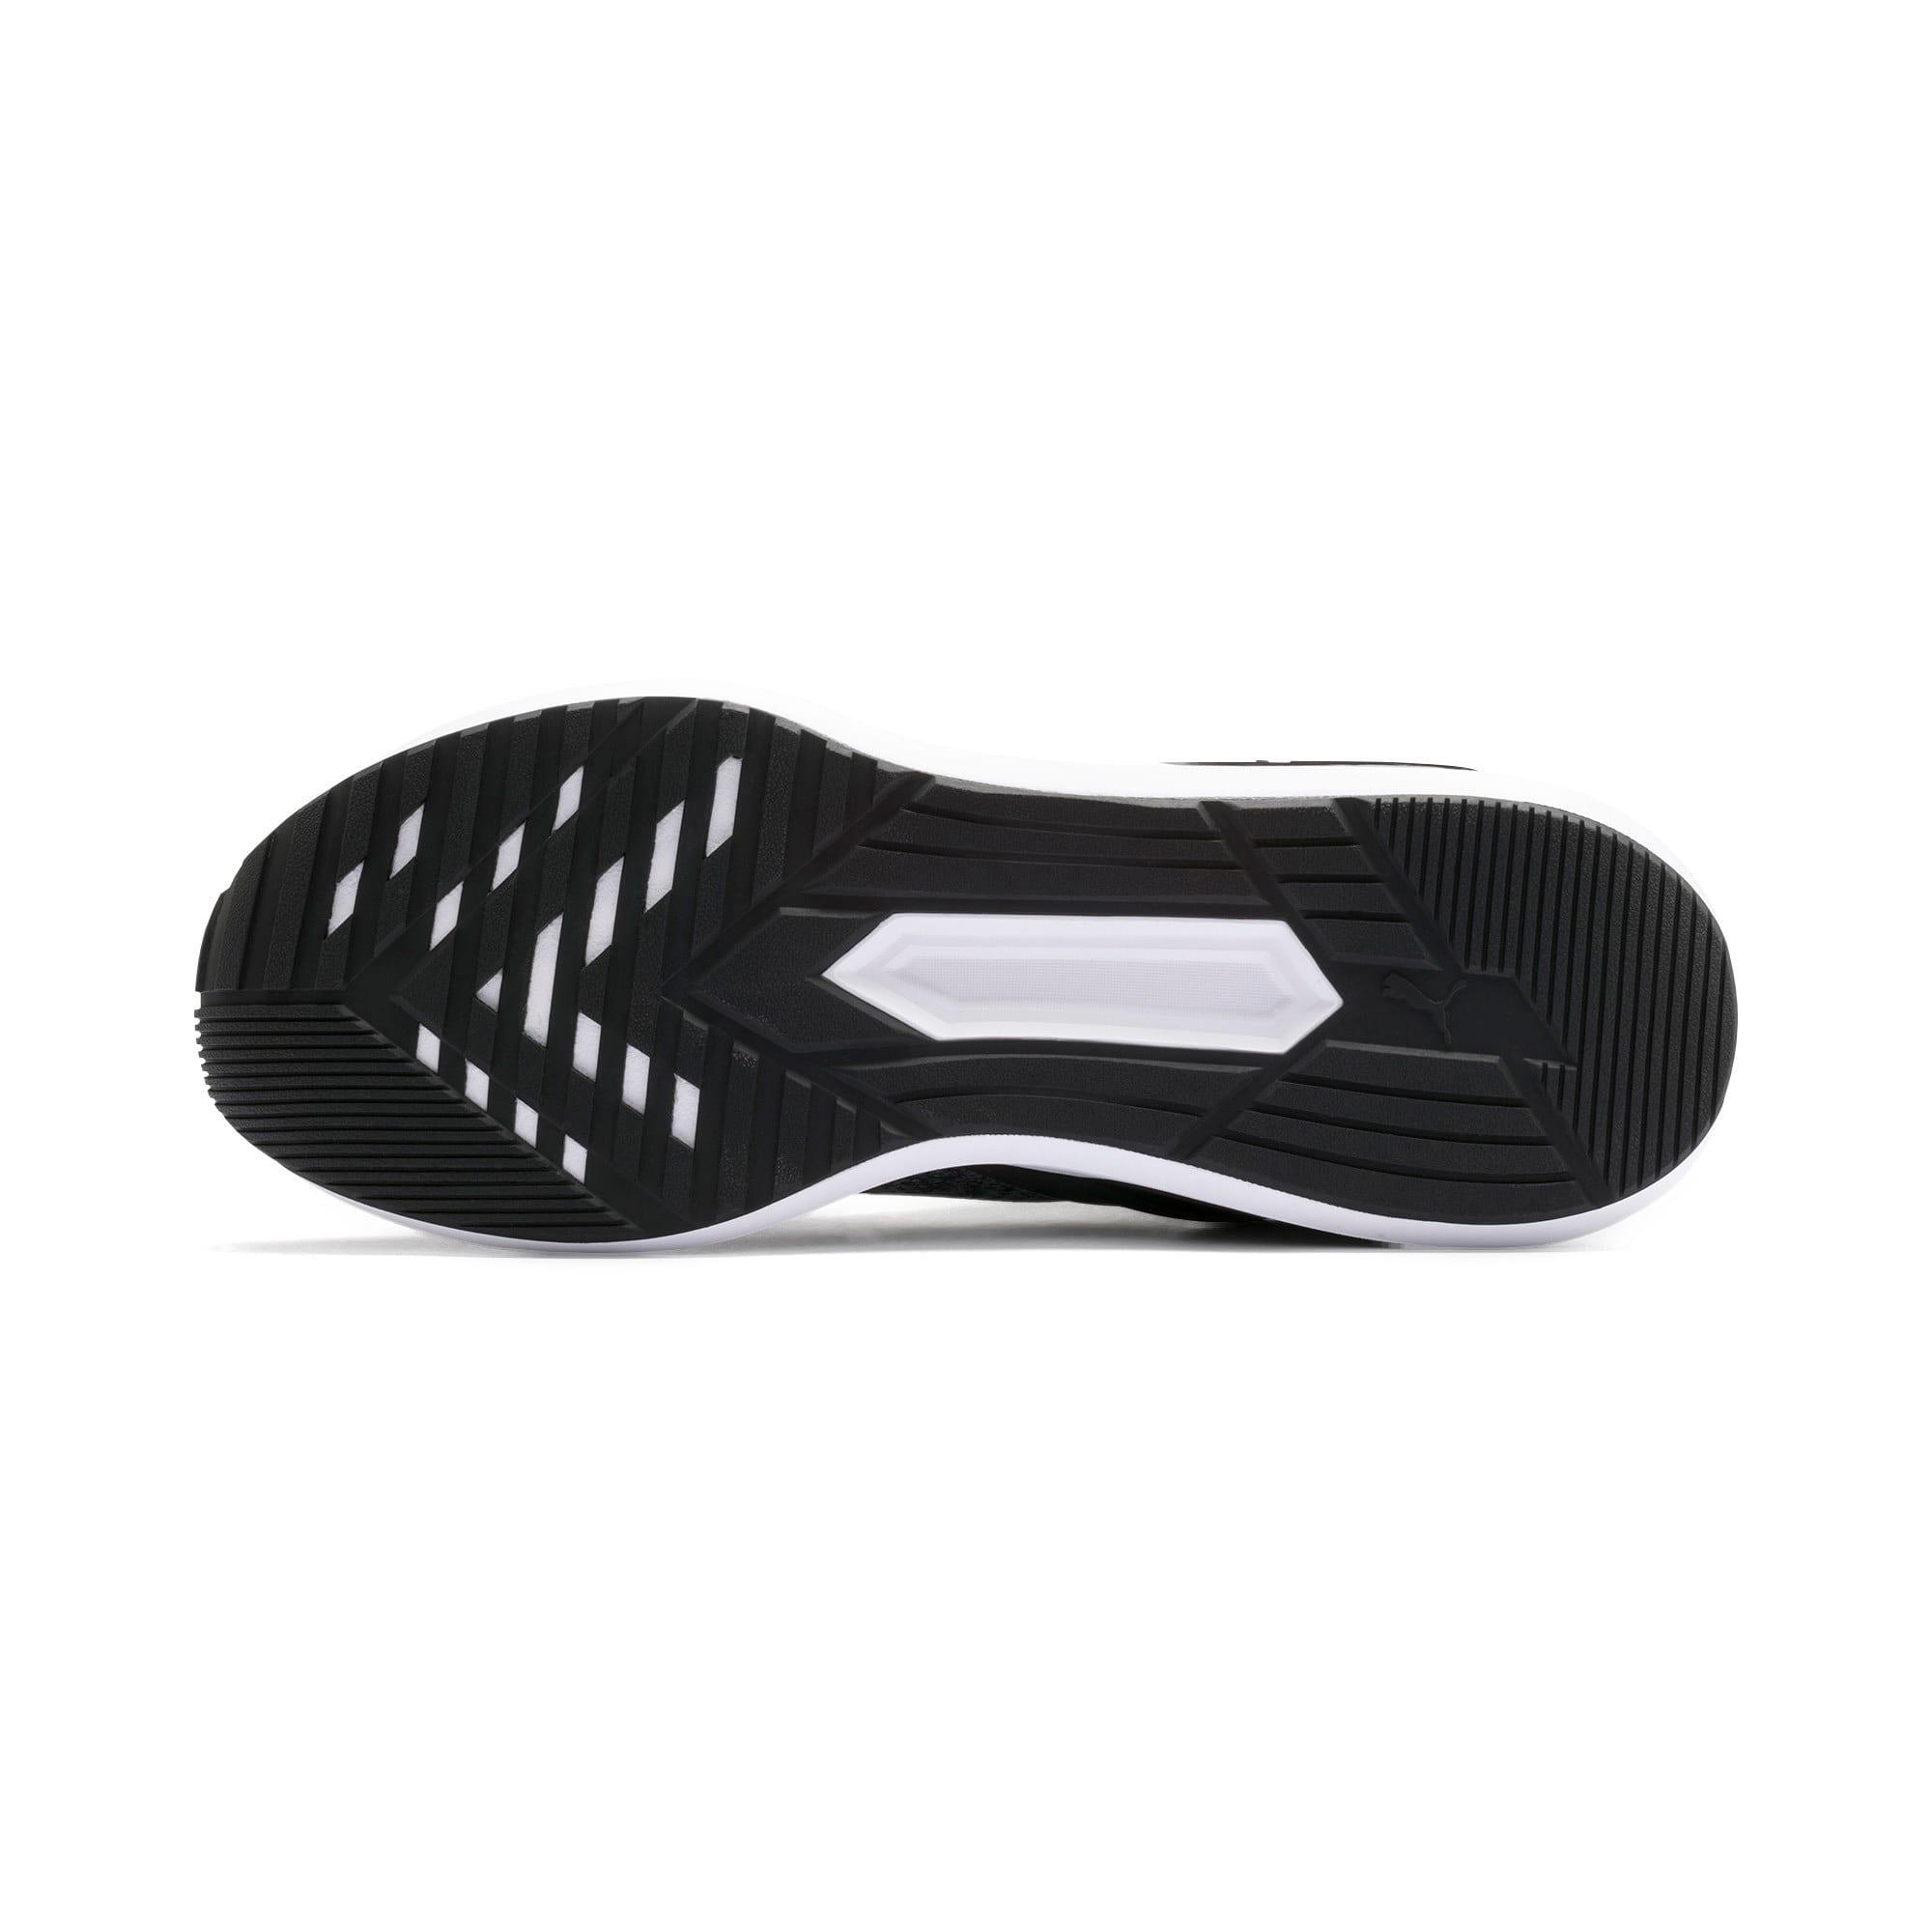 Thumbnail 5 of Rogue X Knit Men's Training Shoes, Black-CASTLEROCK-Gold, medium